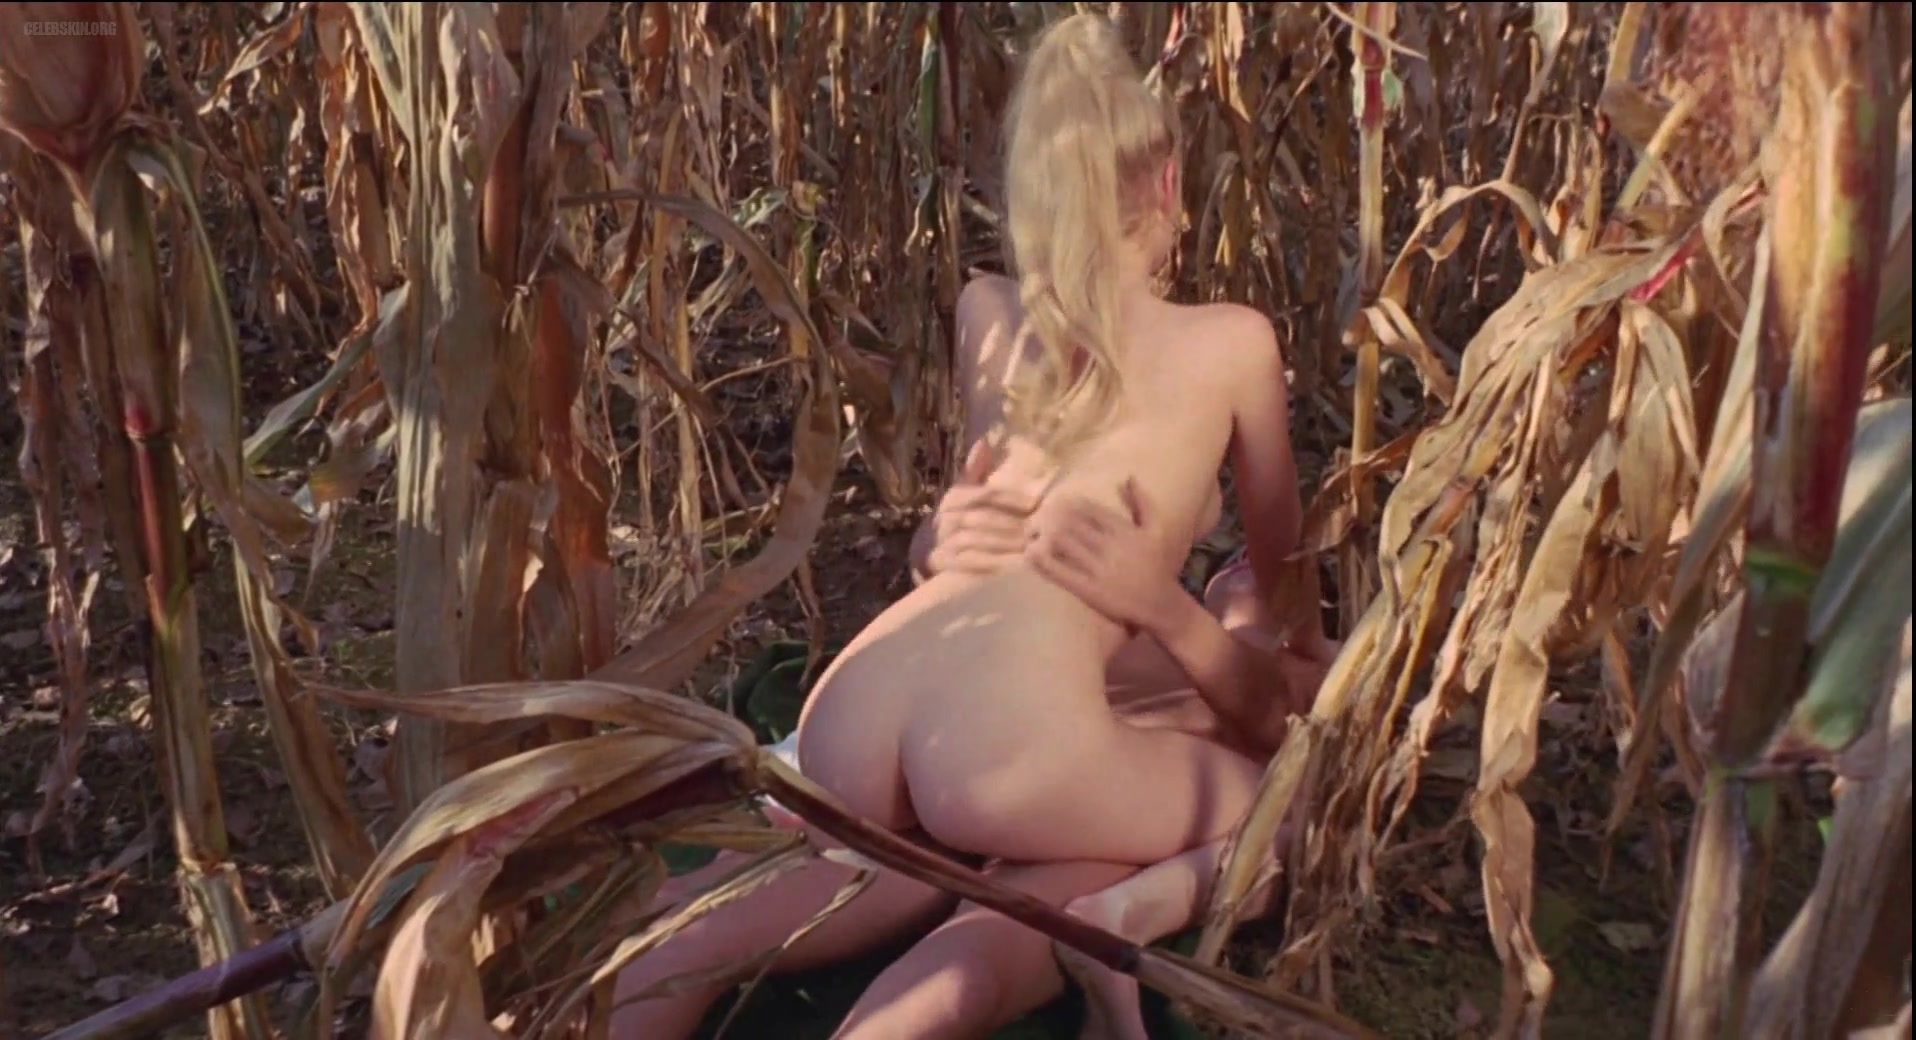 Best porn compilation vol 25 proxy paige edition - 3 8